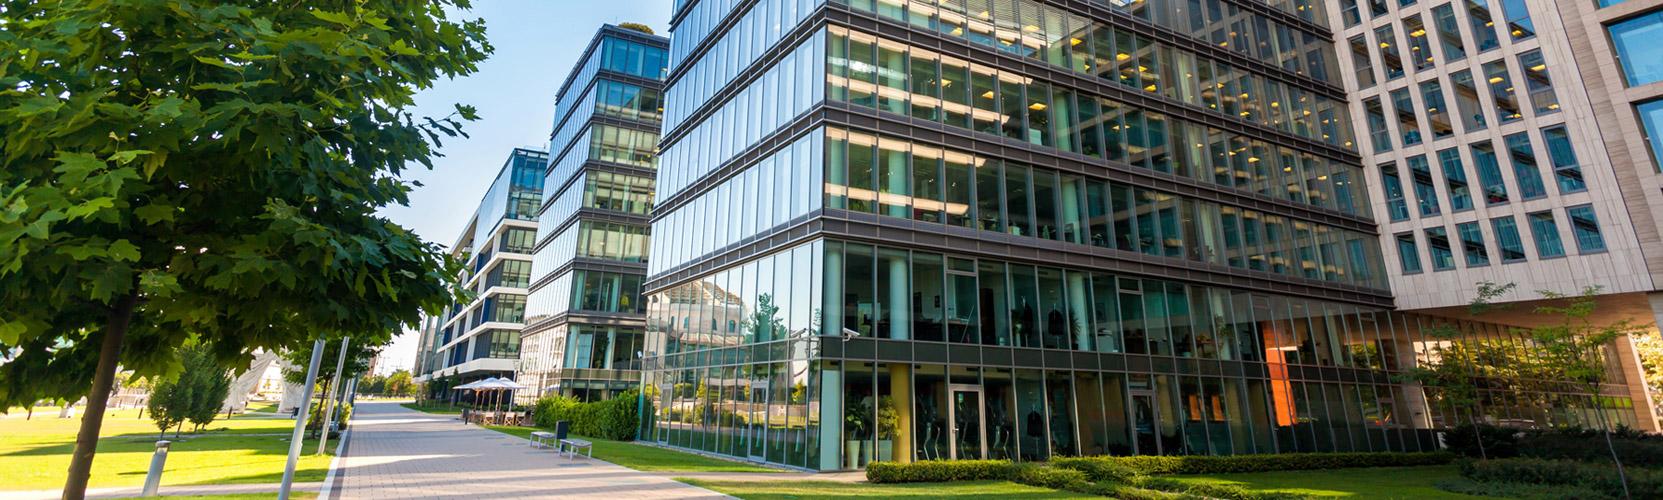 ASC Assurance courtage immeuble